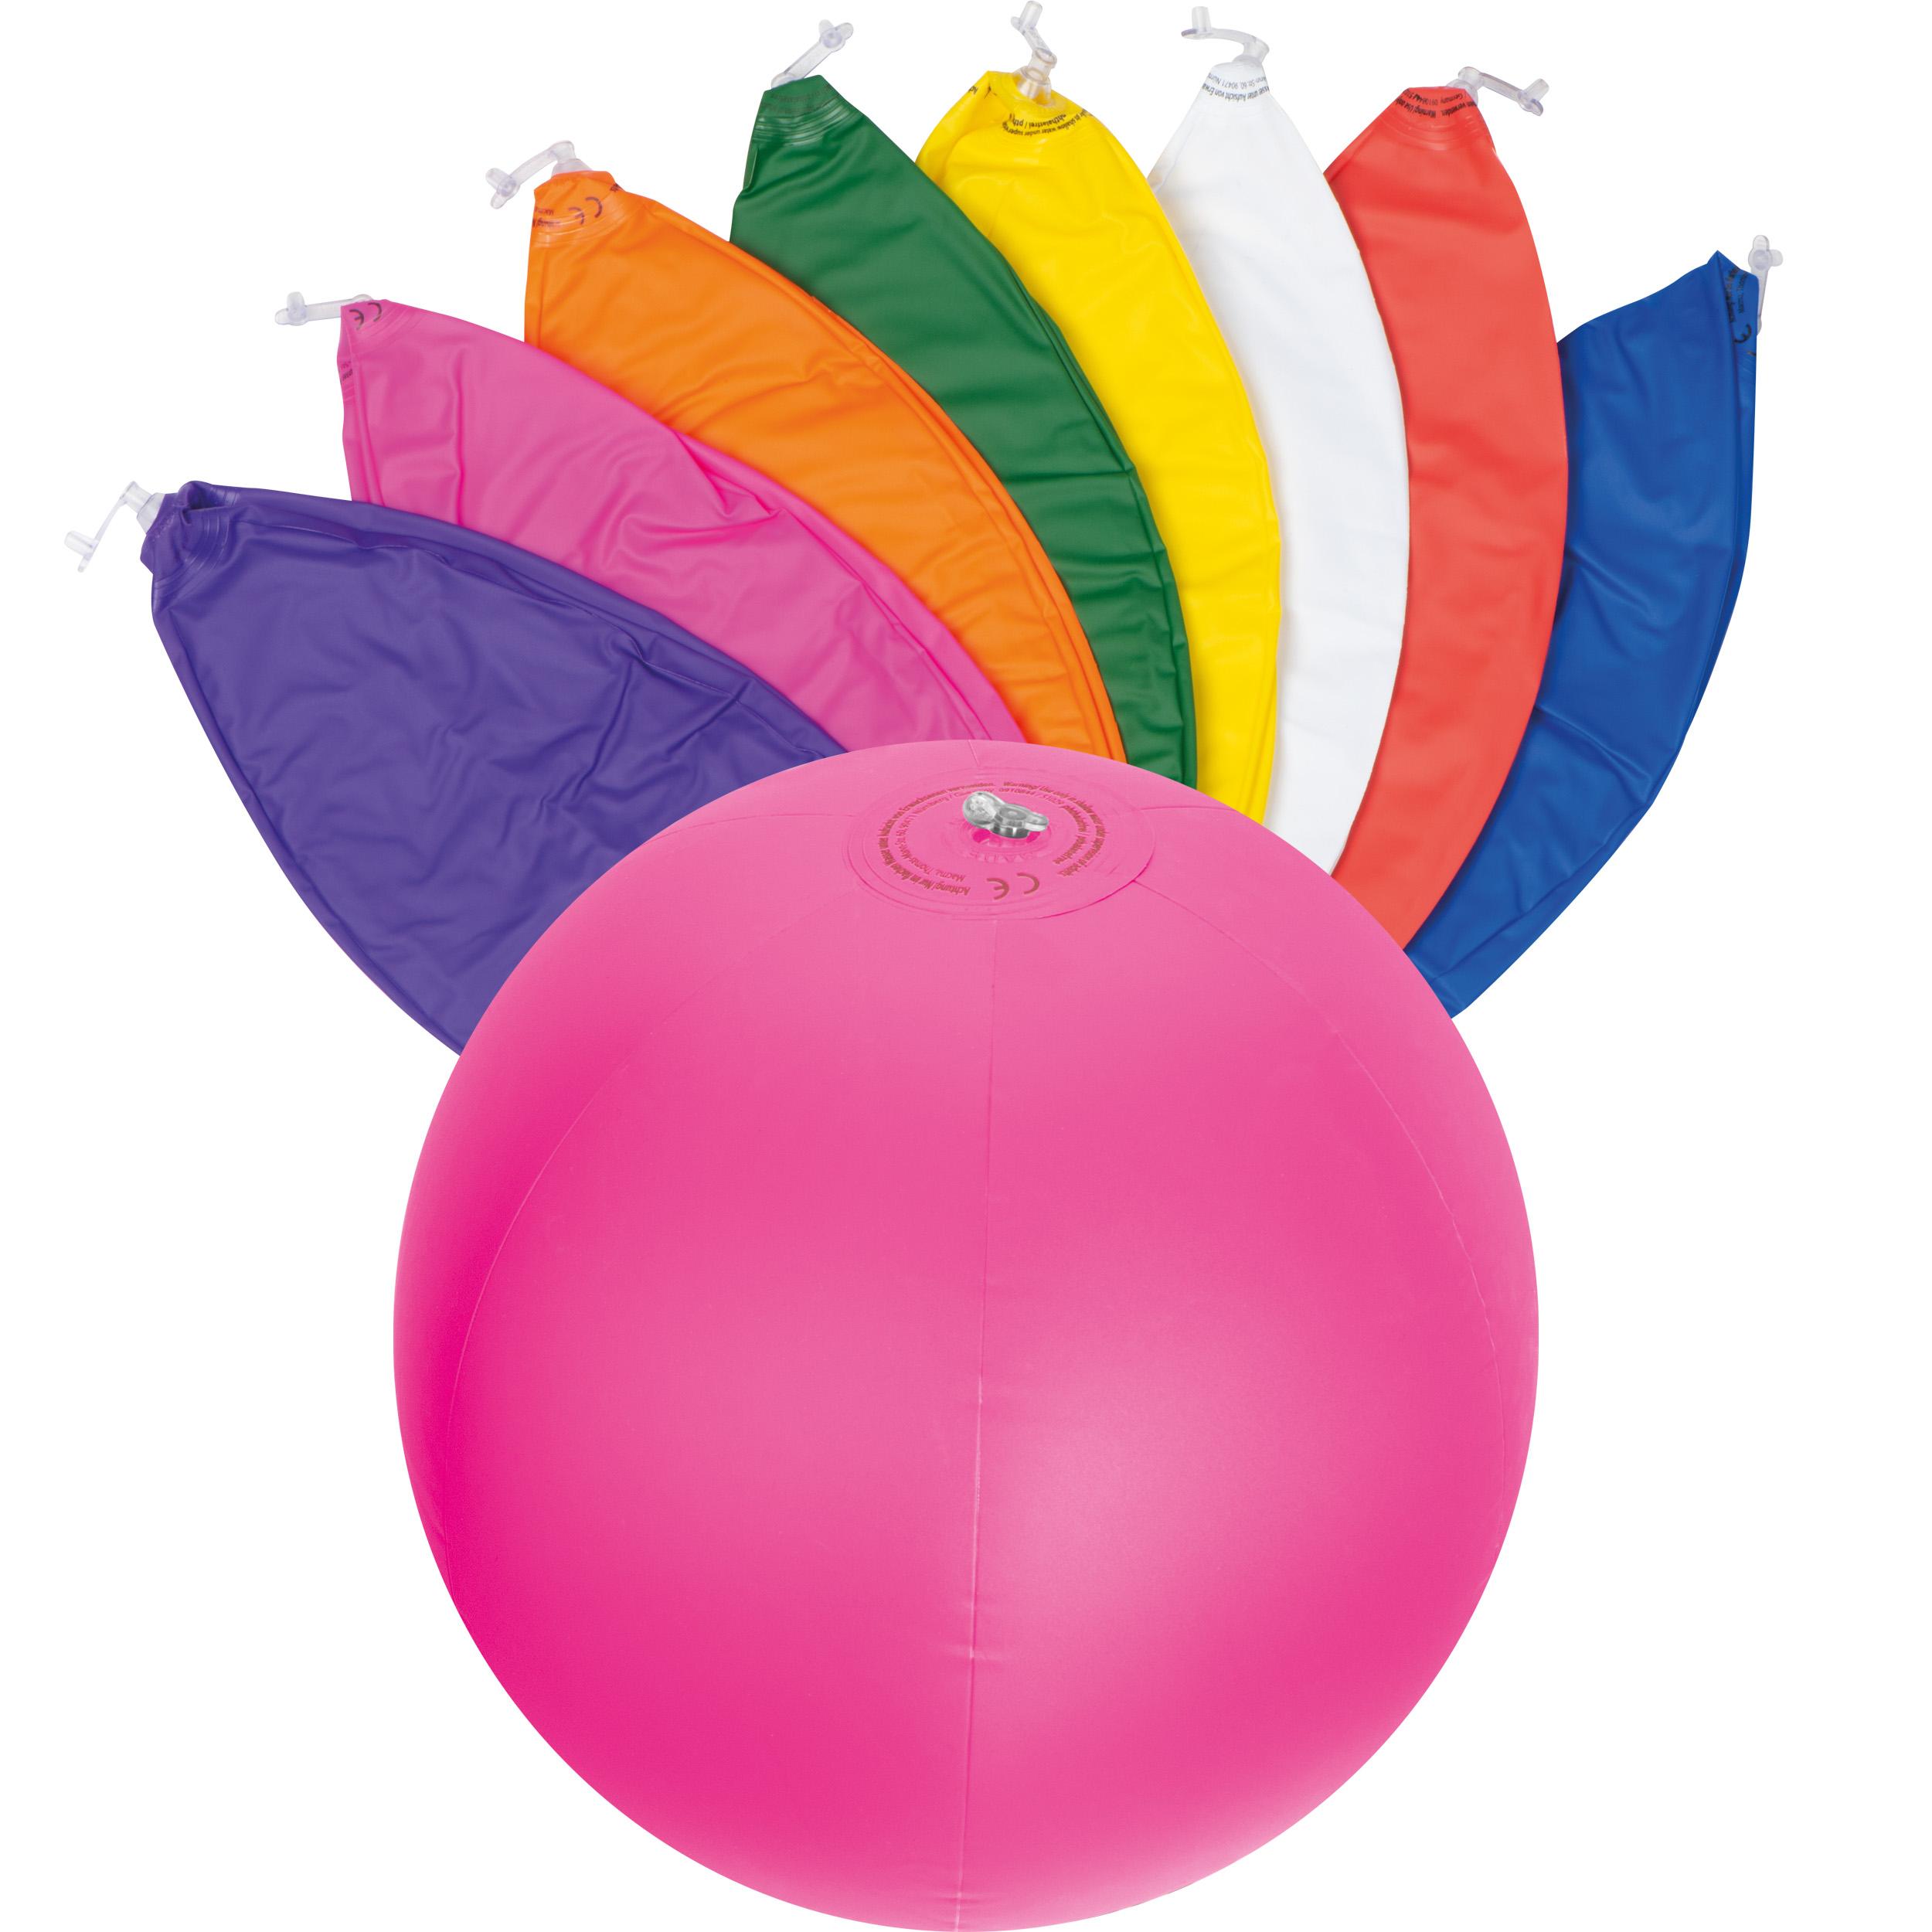 Monocolour beach ball